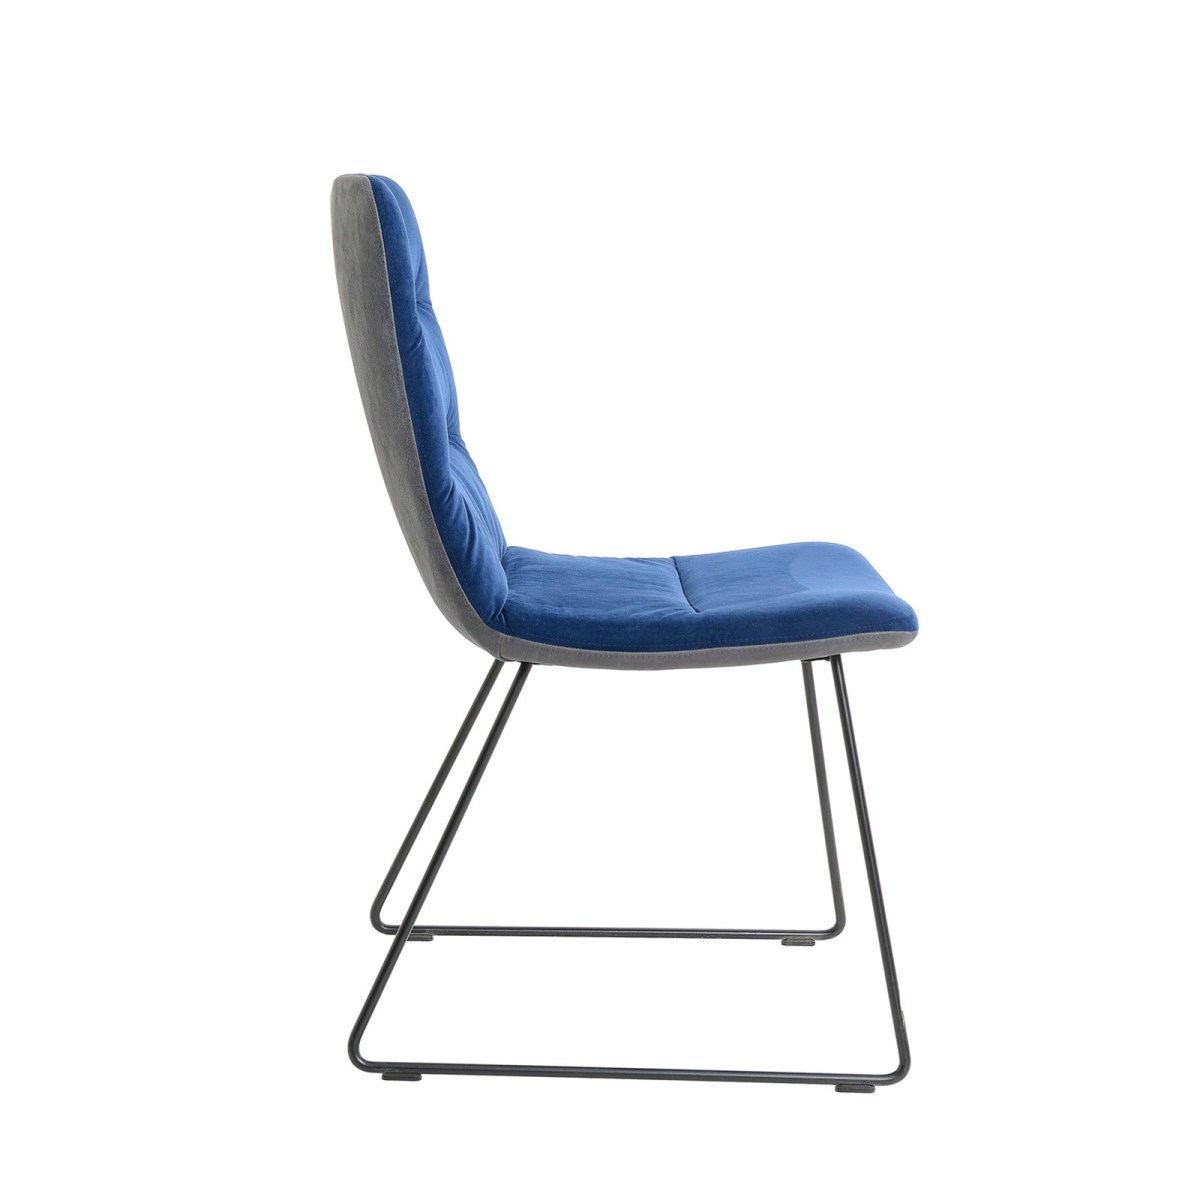 KFF ARVA LIGHT chair with or without armrests designed by KFF   dining   ARVA LIGHT Stuhl mit oder ohne Armlehnen designed by KFF